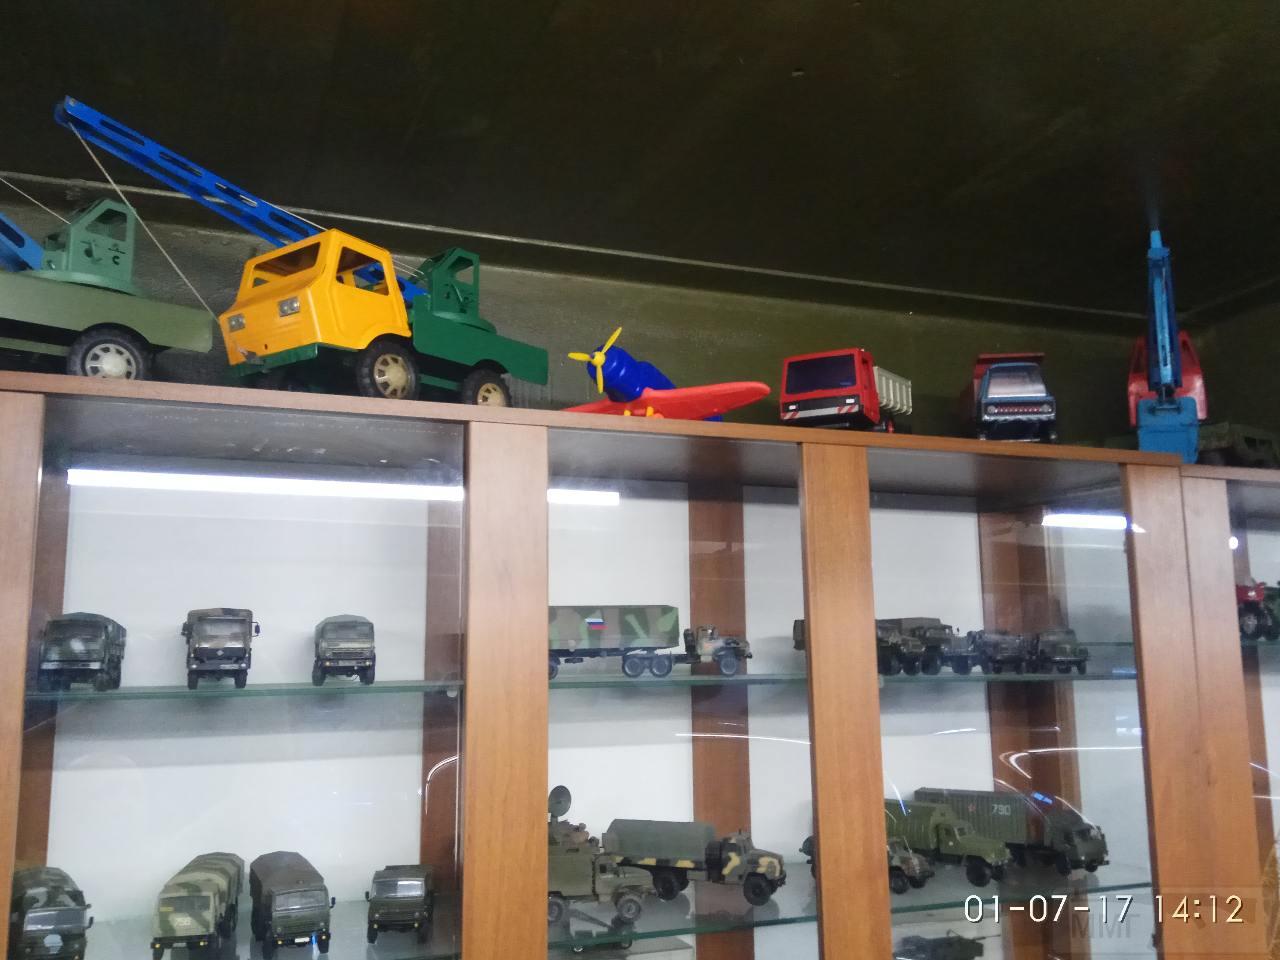 11450 - Музей техники Фаэтон в г. Запорожье